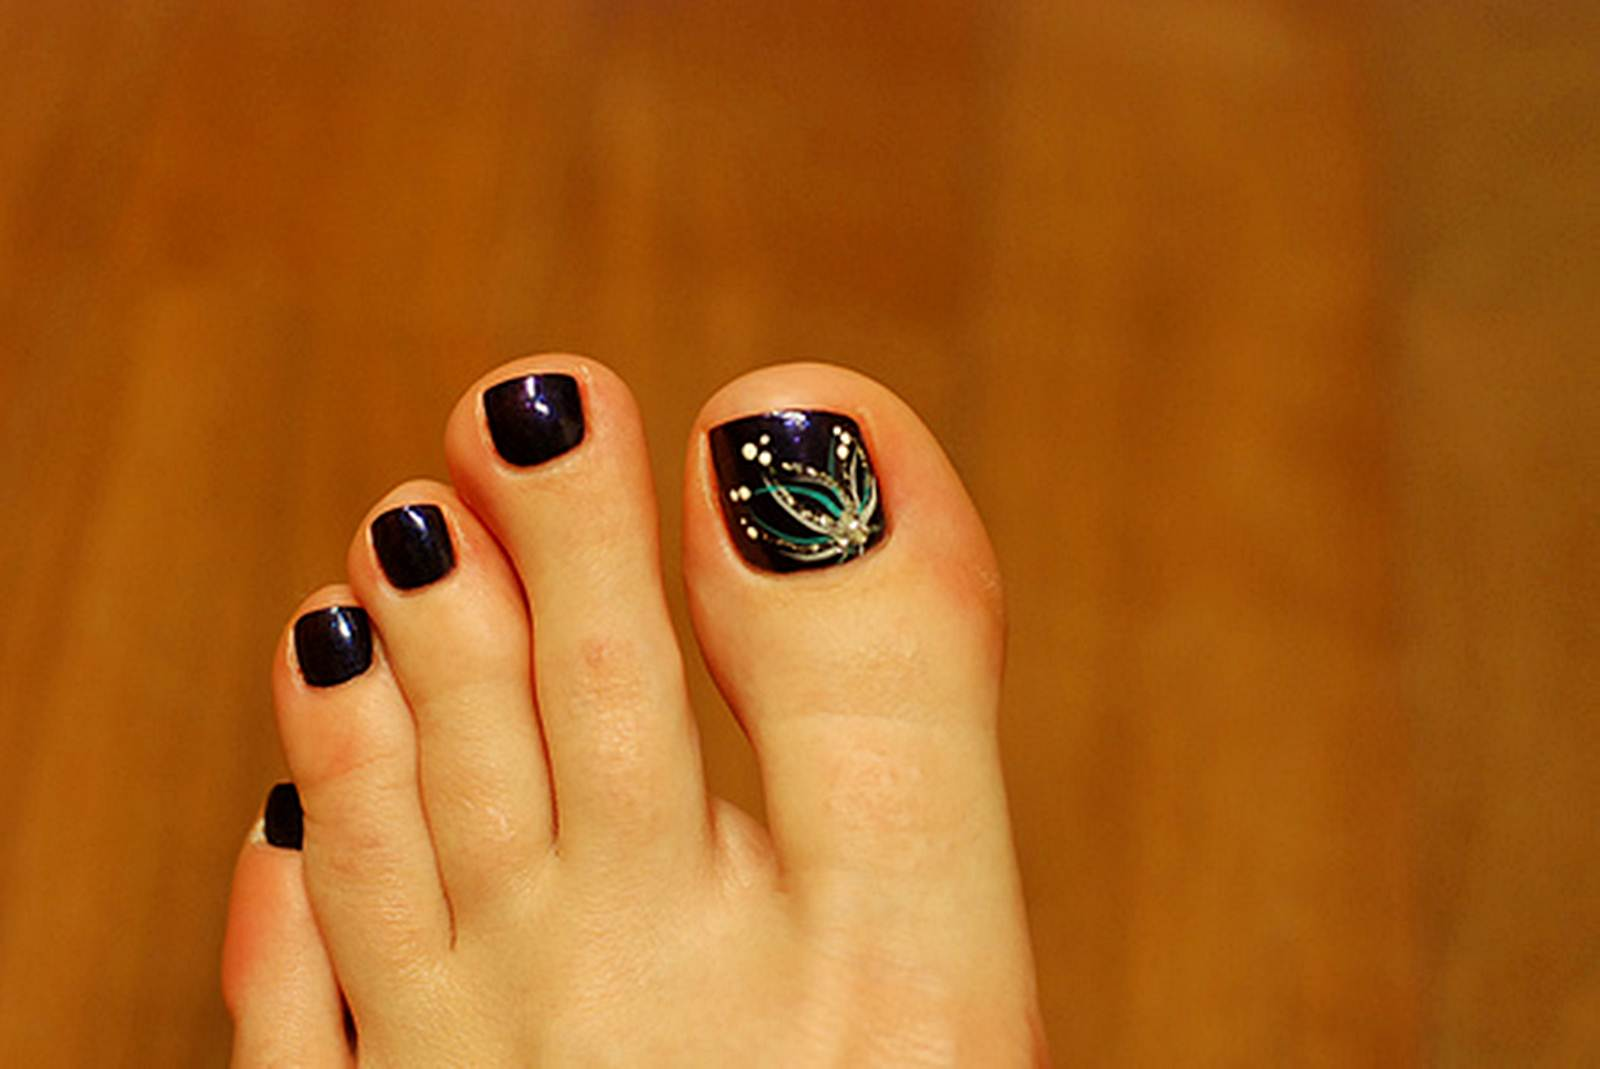 Nails Art: 55 Latest Toe Nail Art Designs